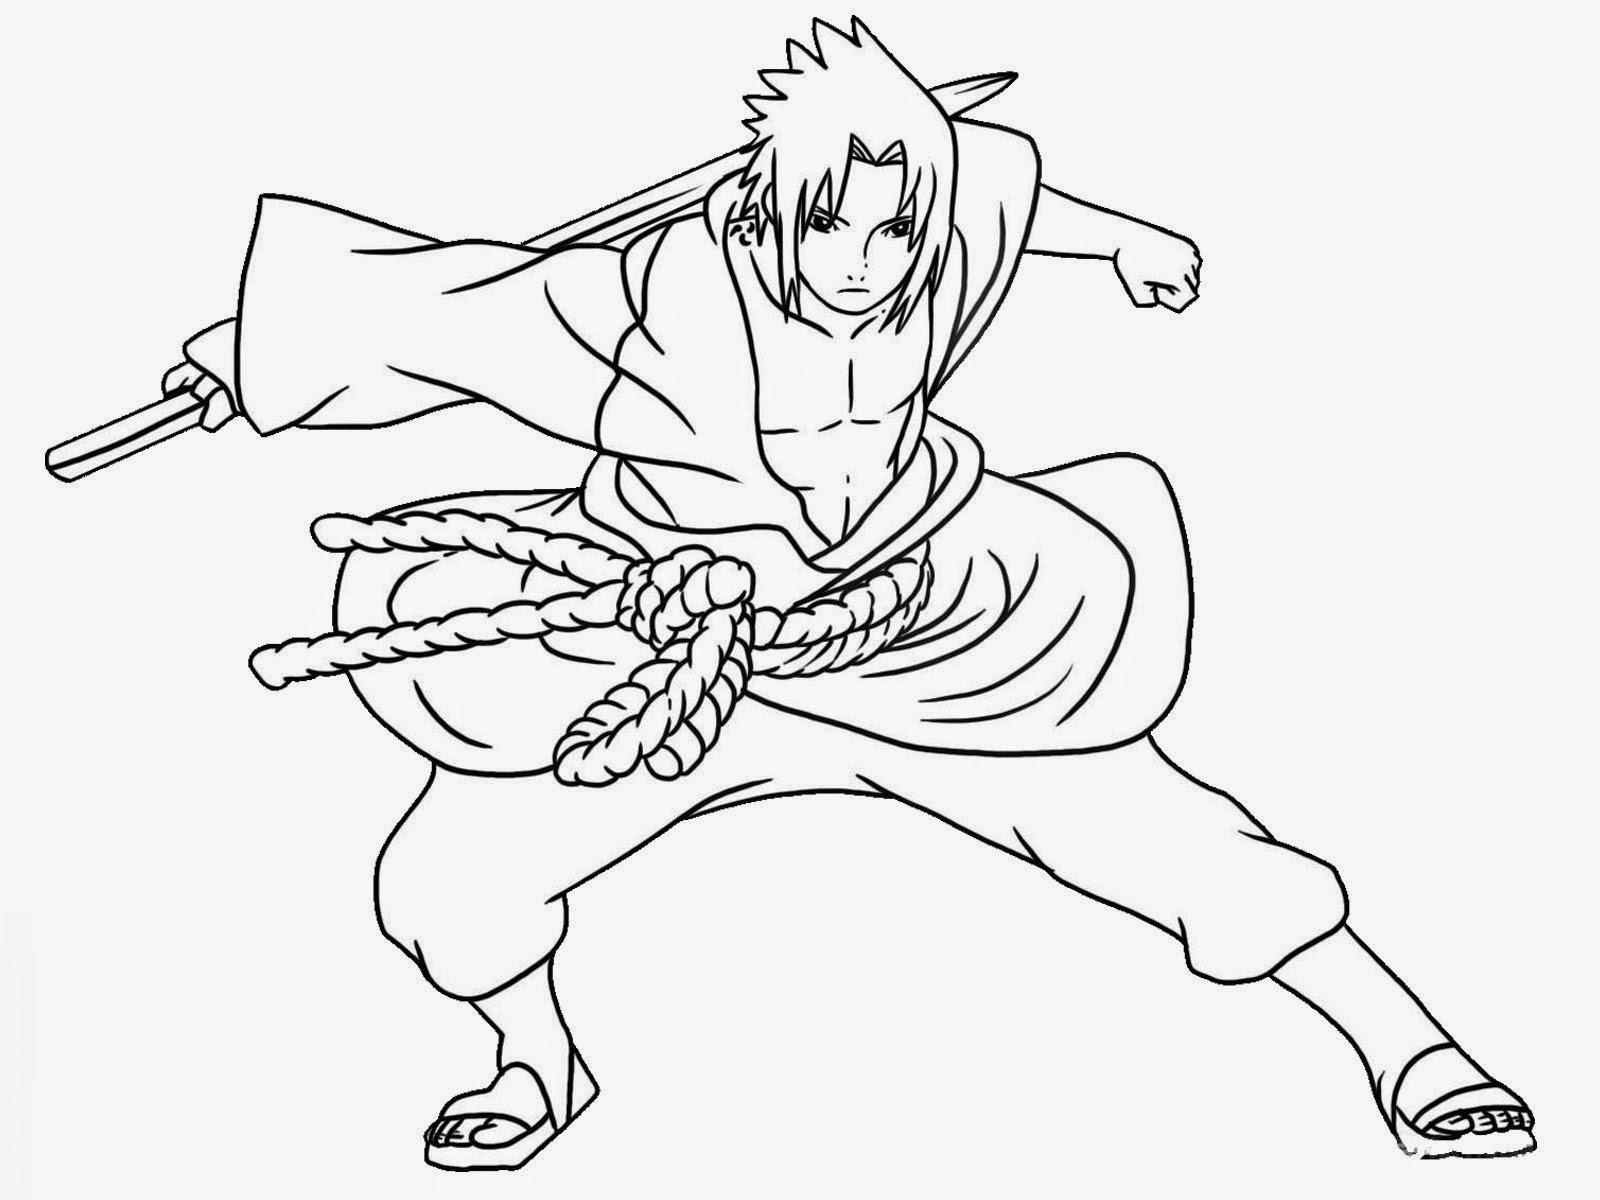 Gambar Mewarnai Naruto